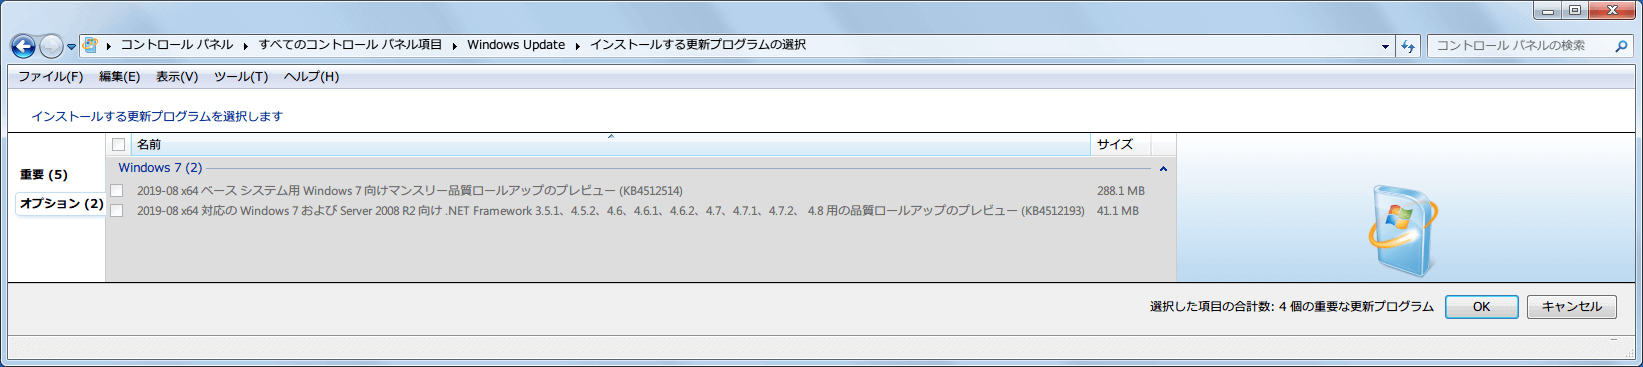 Windows 7 64bit Windows Update オプション 2019年8月分リスト KB4512514、KB4512193 非表示